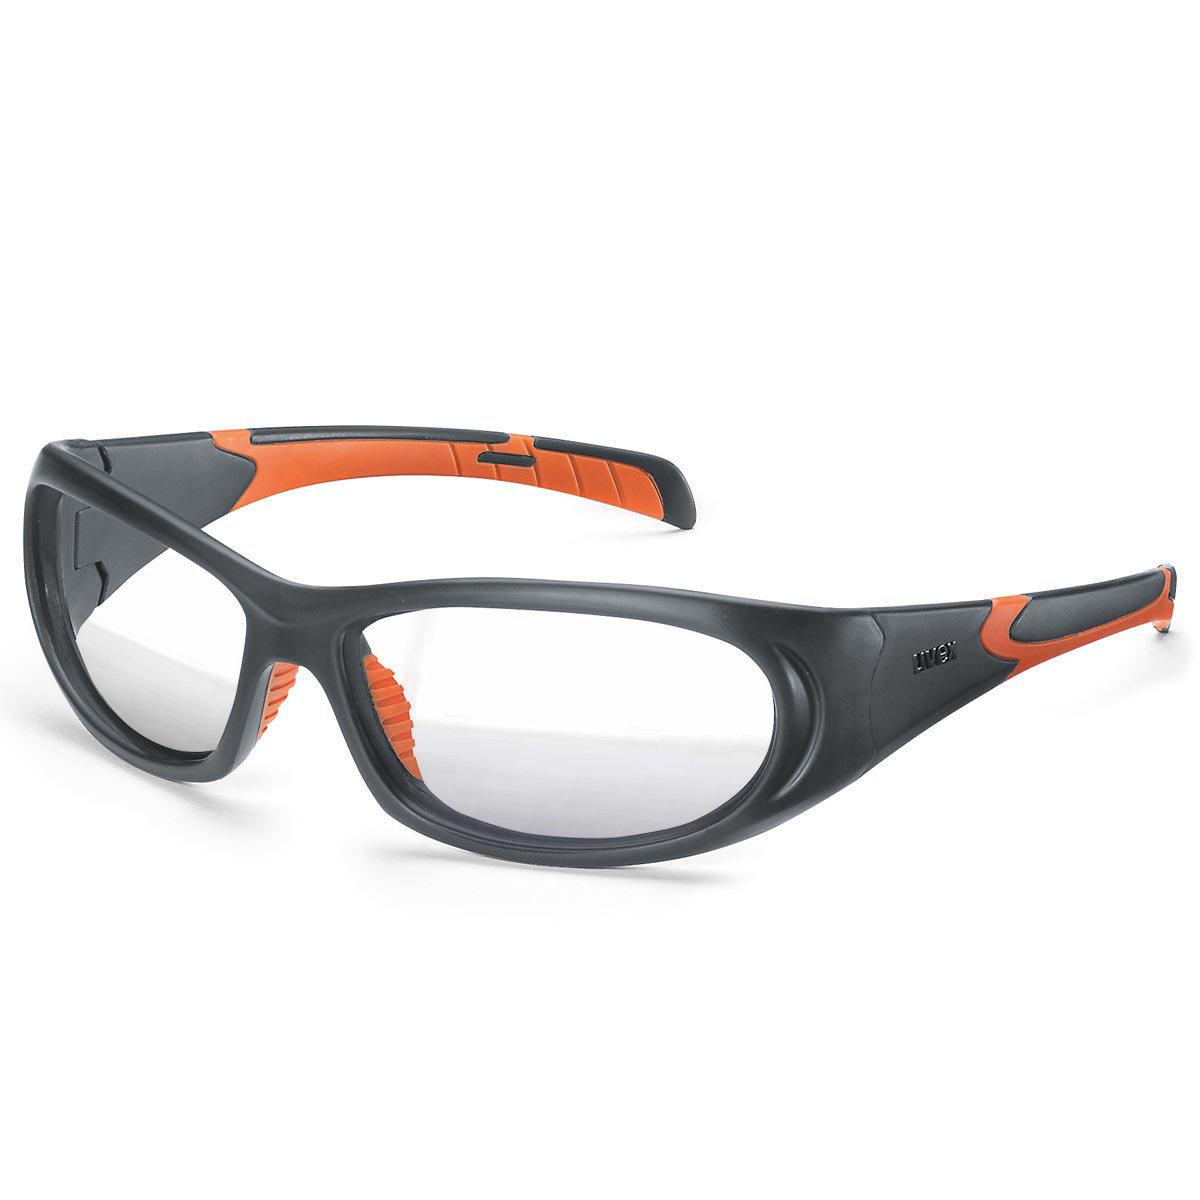 Uvex Korrektionsschutzbrille RX sp 5510 - UV blue protect